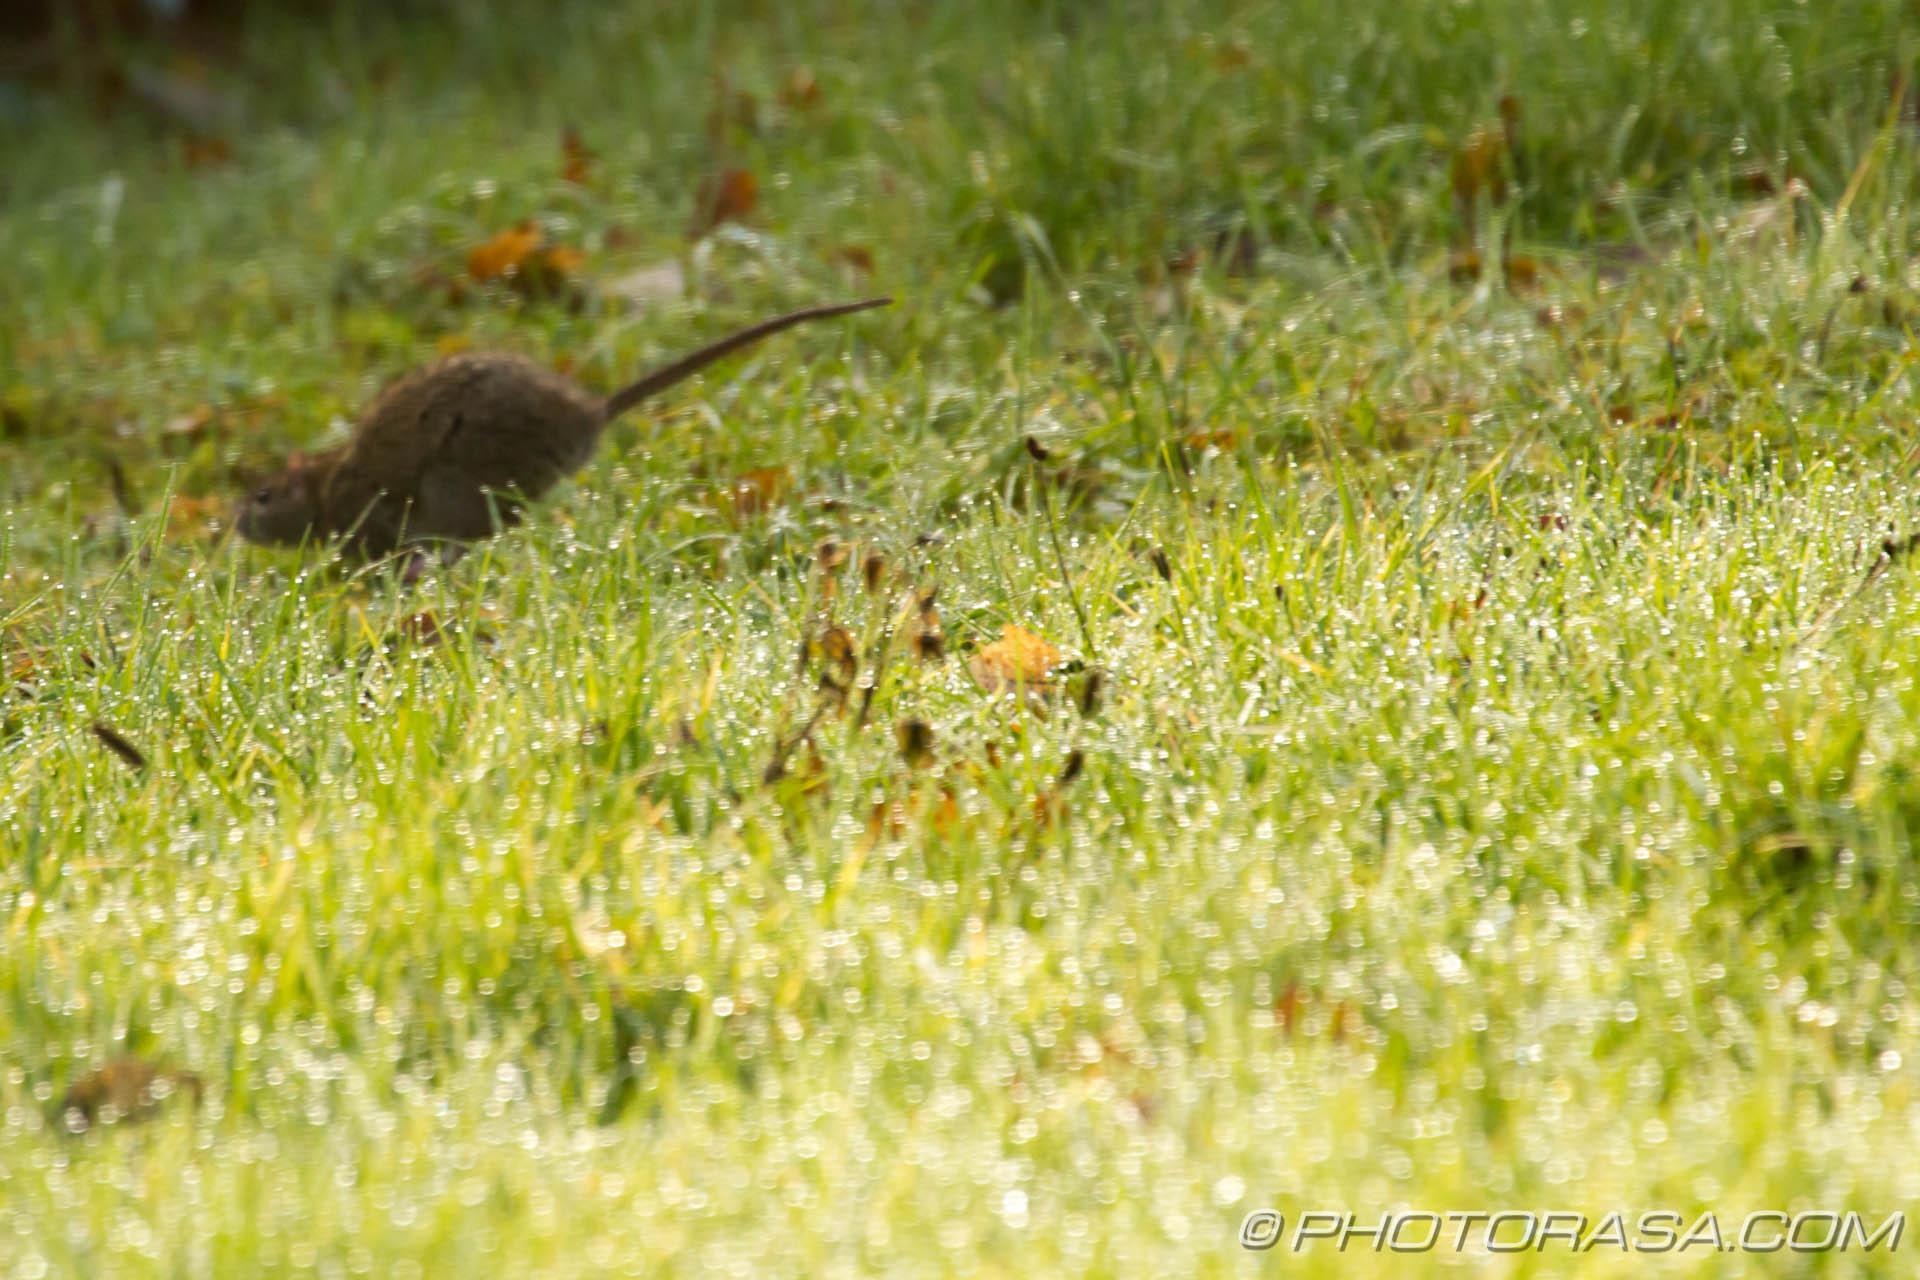 http://photorasa.com/river-rat-maidstone-market/skipping-off-through-the-dewy-grass/